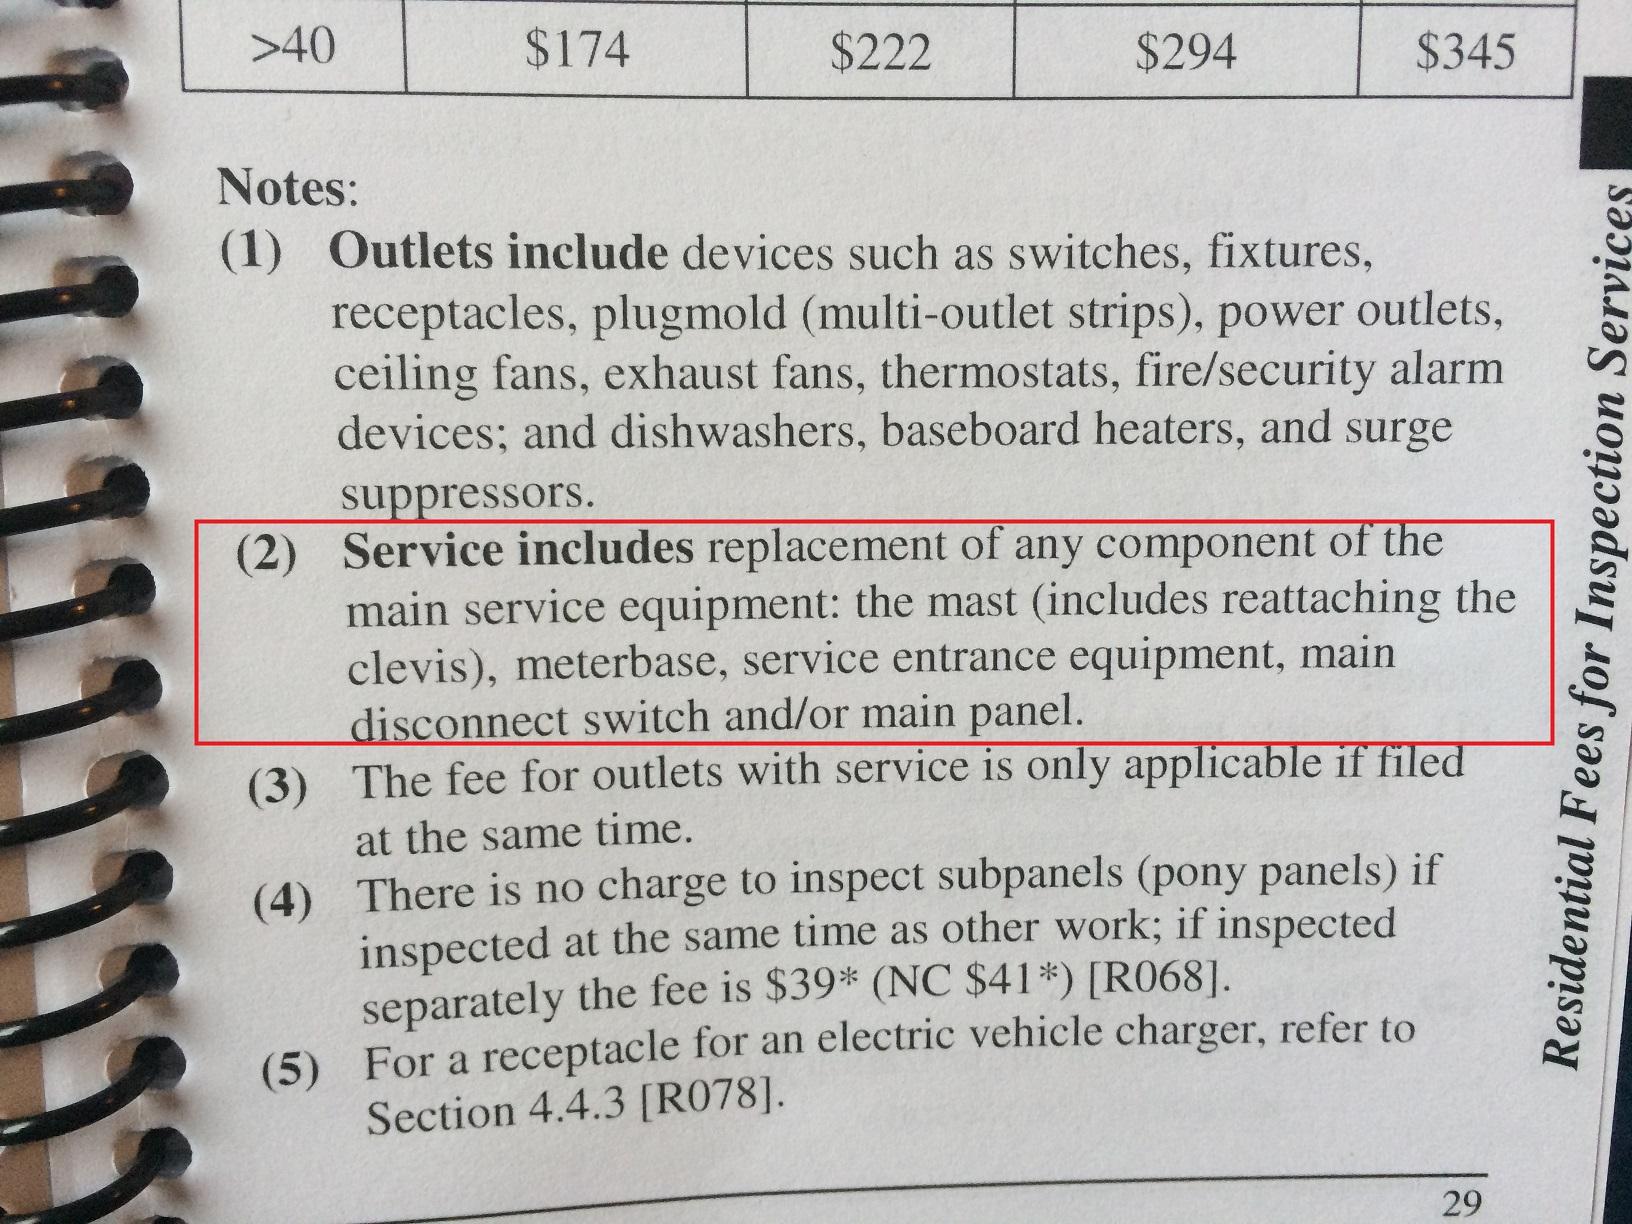 Explain these renovation ESA fees to me-img_8113.jpg